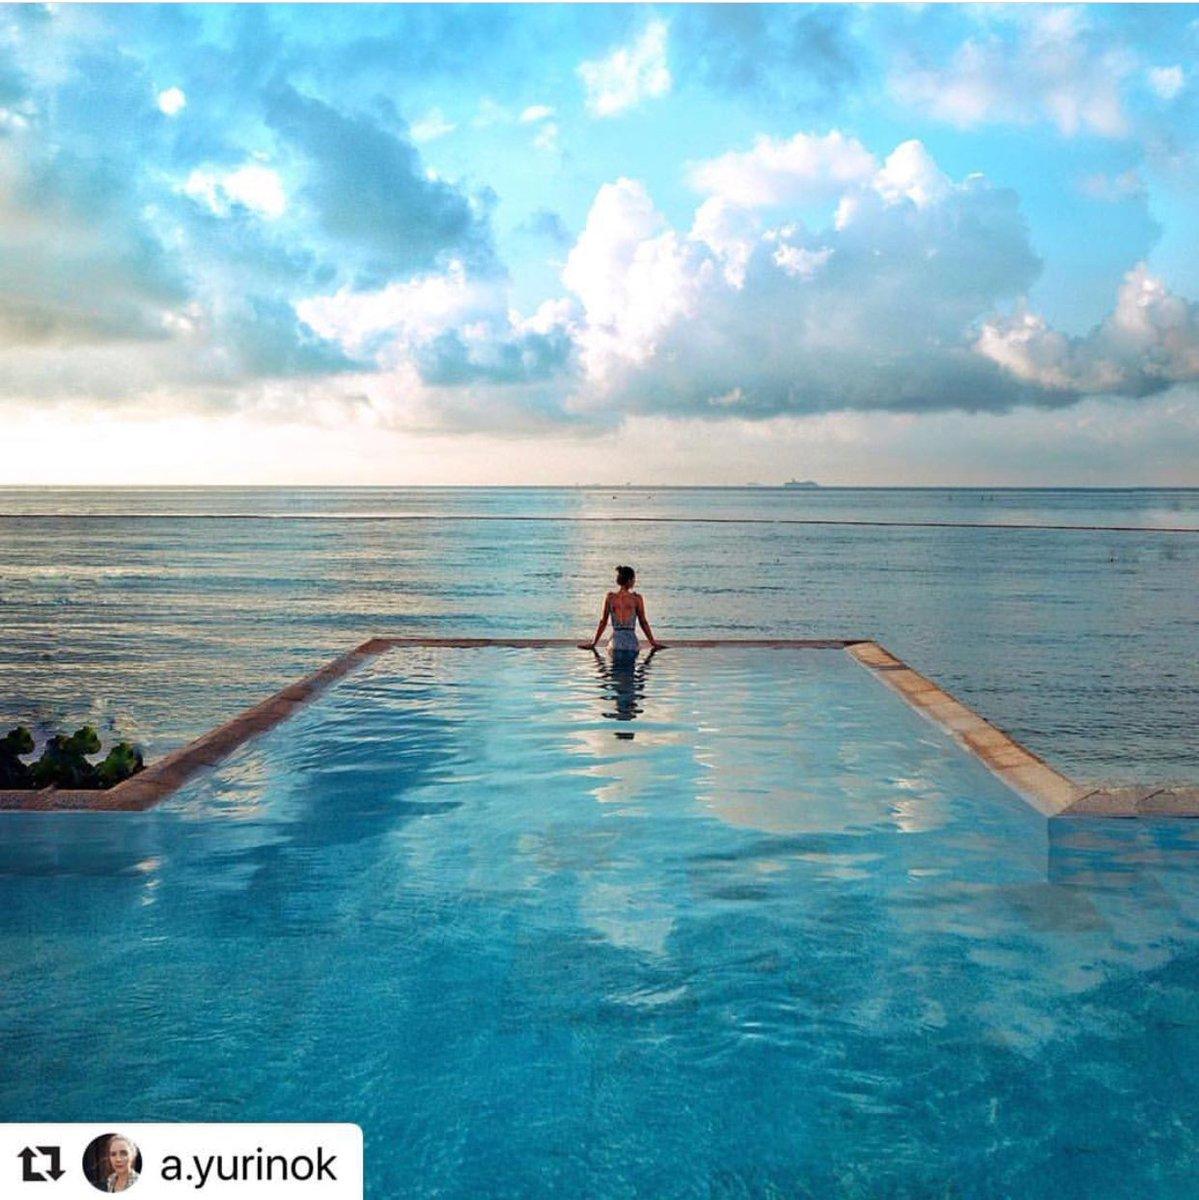 Morning in paradise! 🌊 Photo by a.yurinok on Instagram #GoGrand @hyatt https://t.co/Uv4zZBL4LS